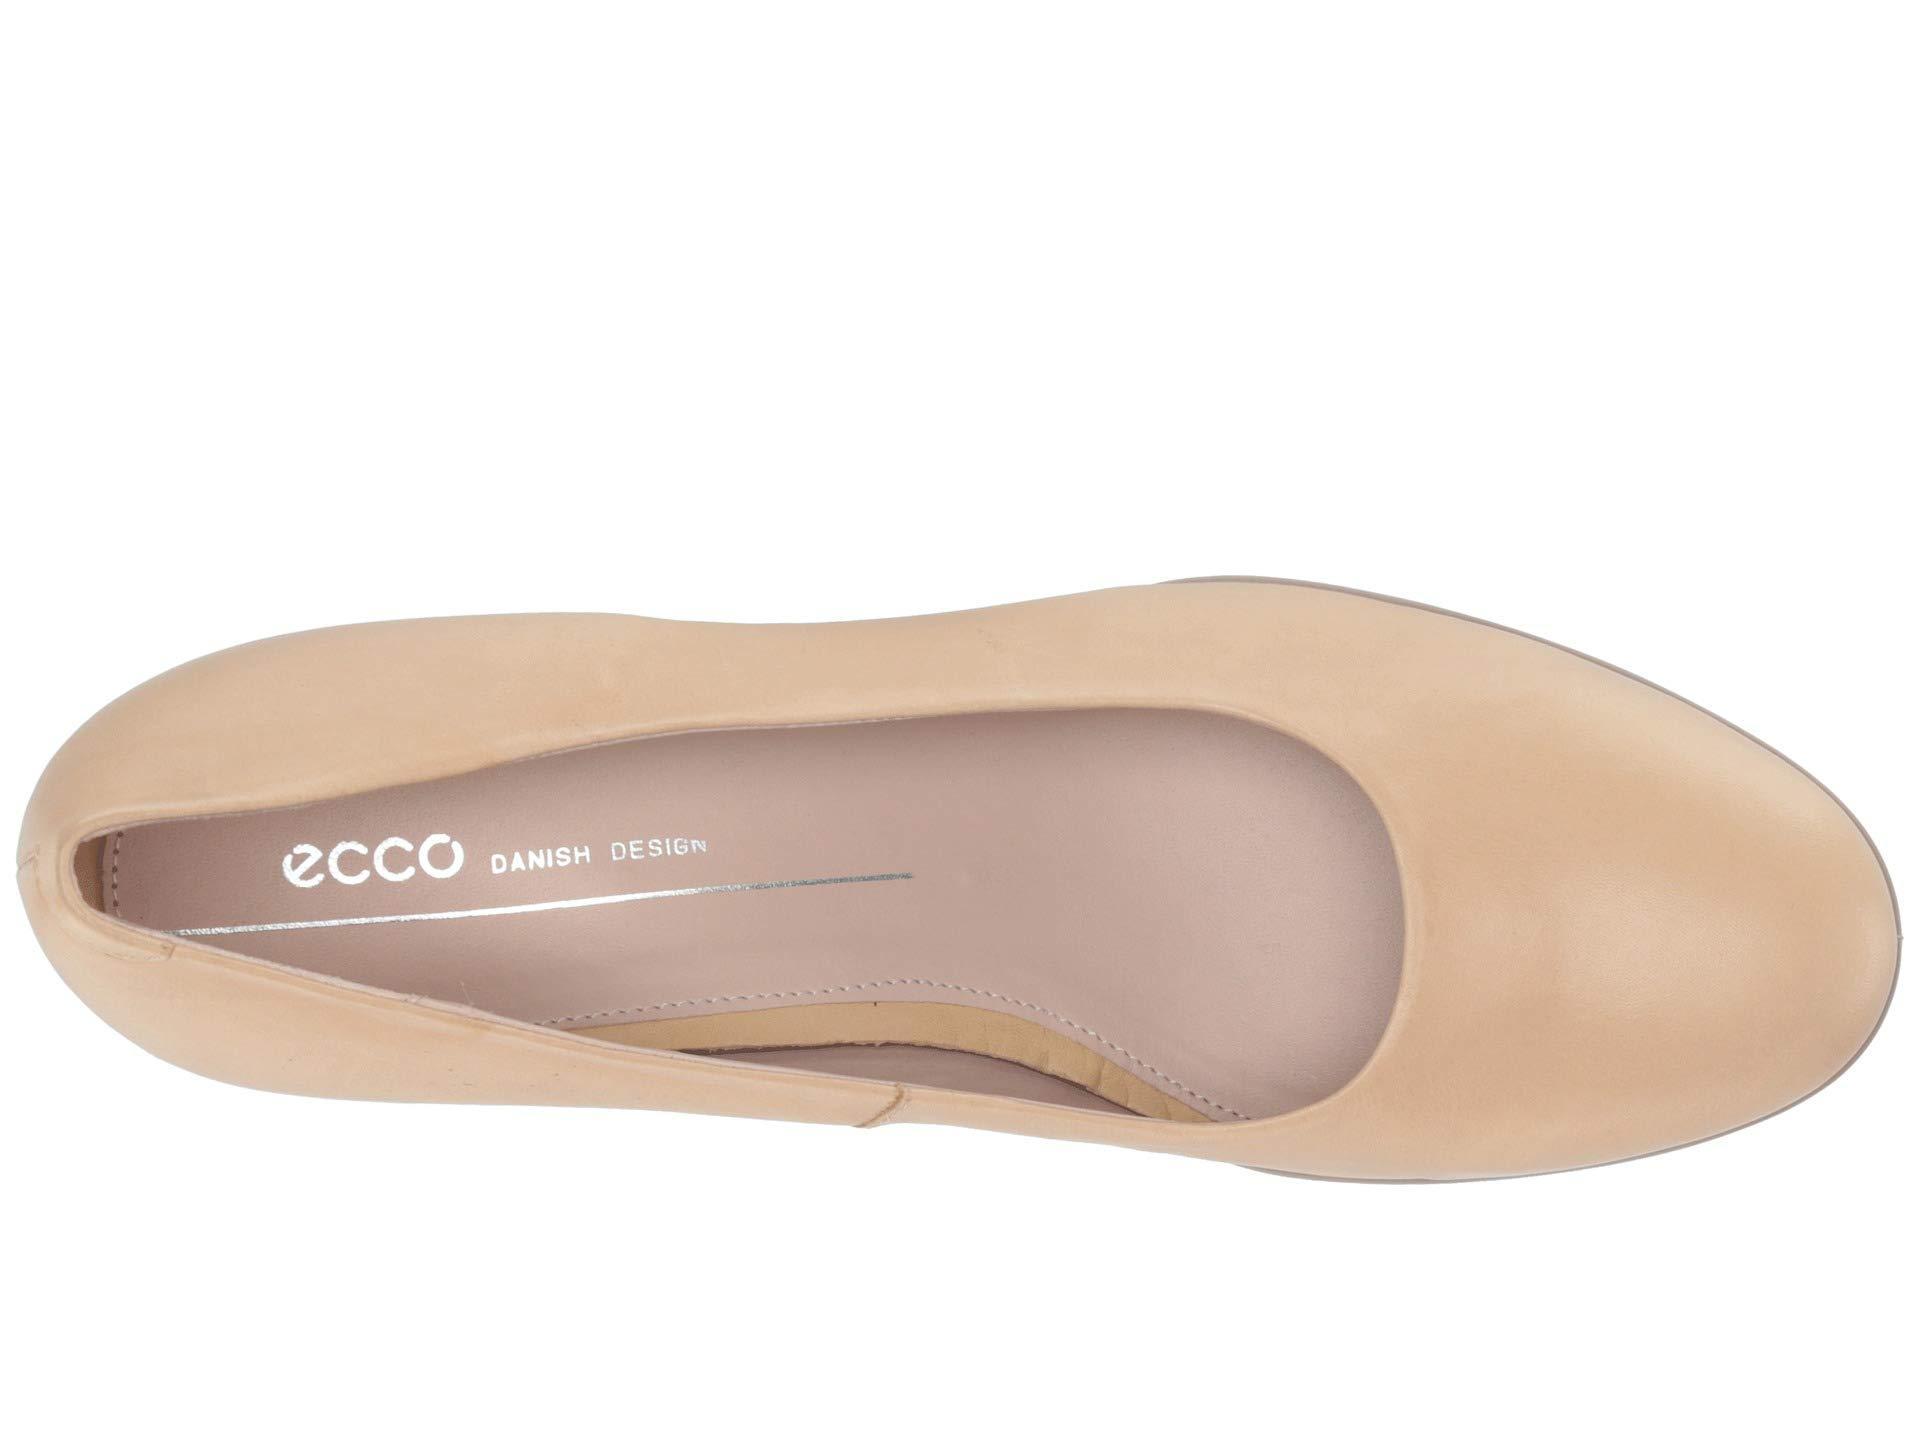 37bbd89f Ecco - Multicolor Shape 35 Mod Block Pump (powder Calf Leather) High Heels  -. View fullscreen